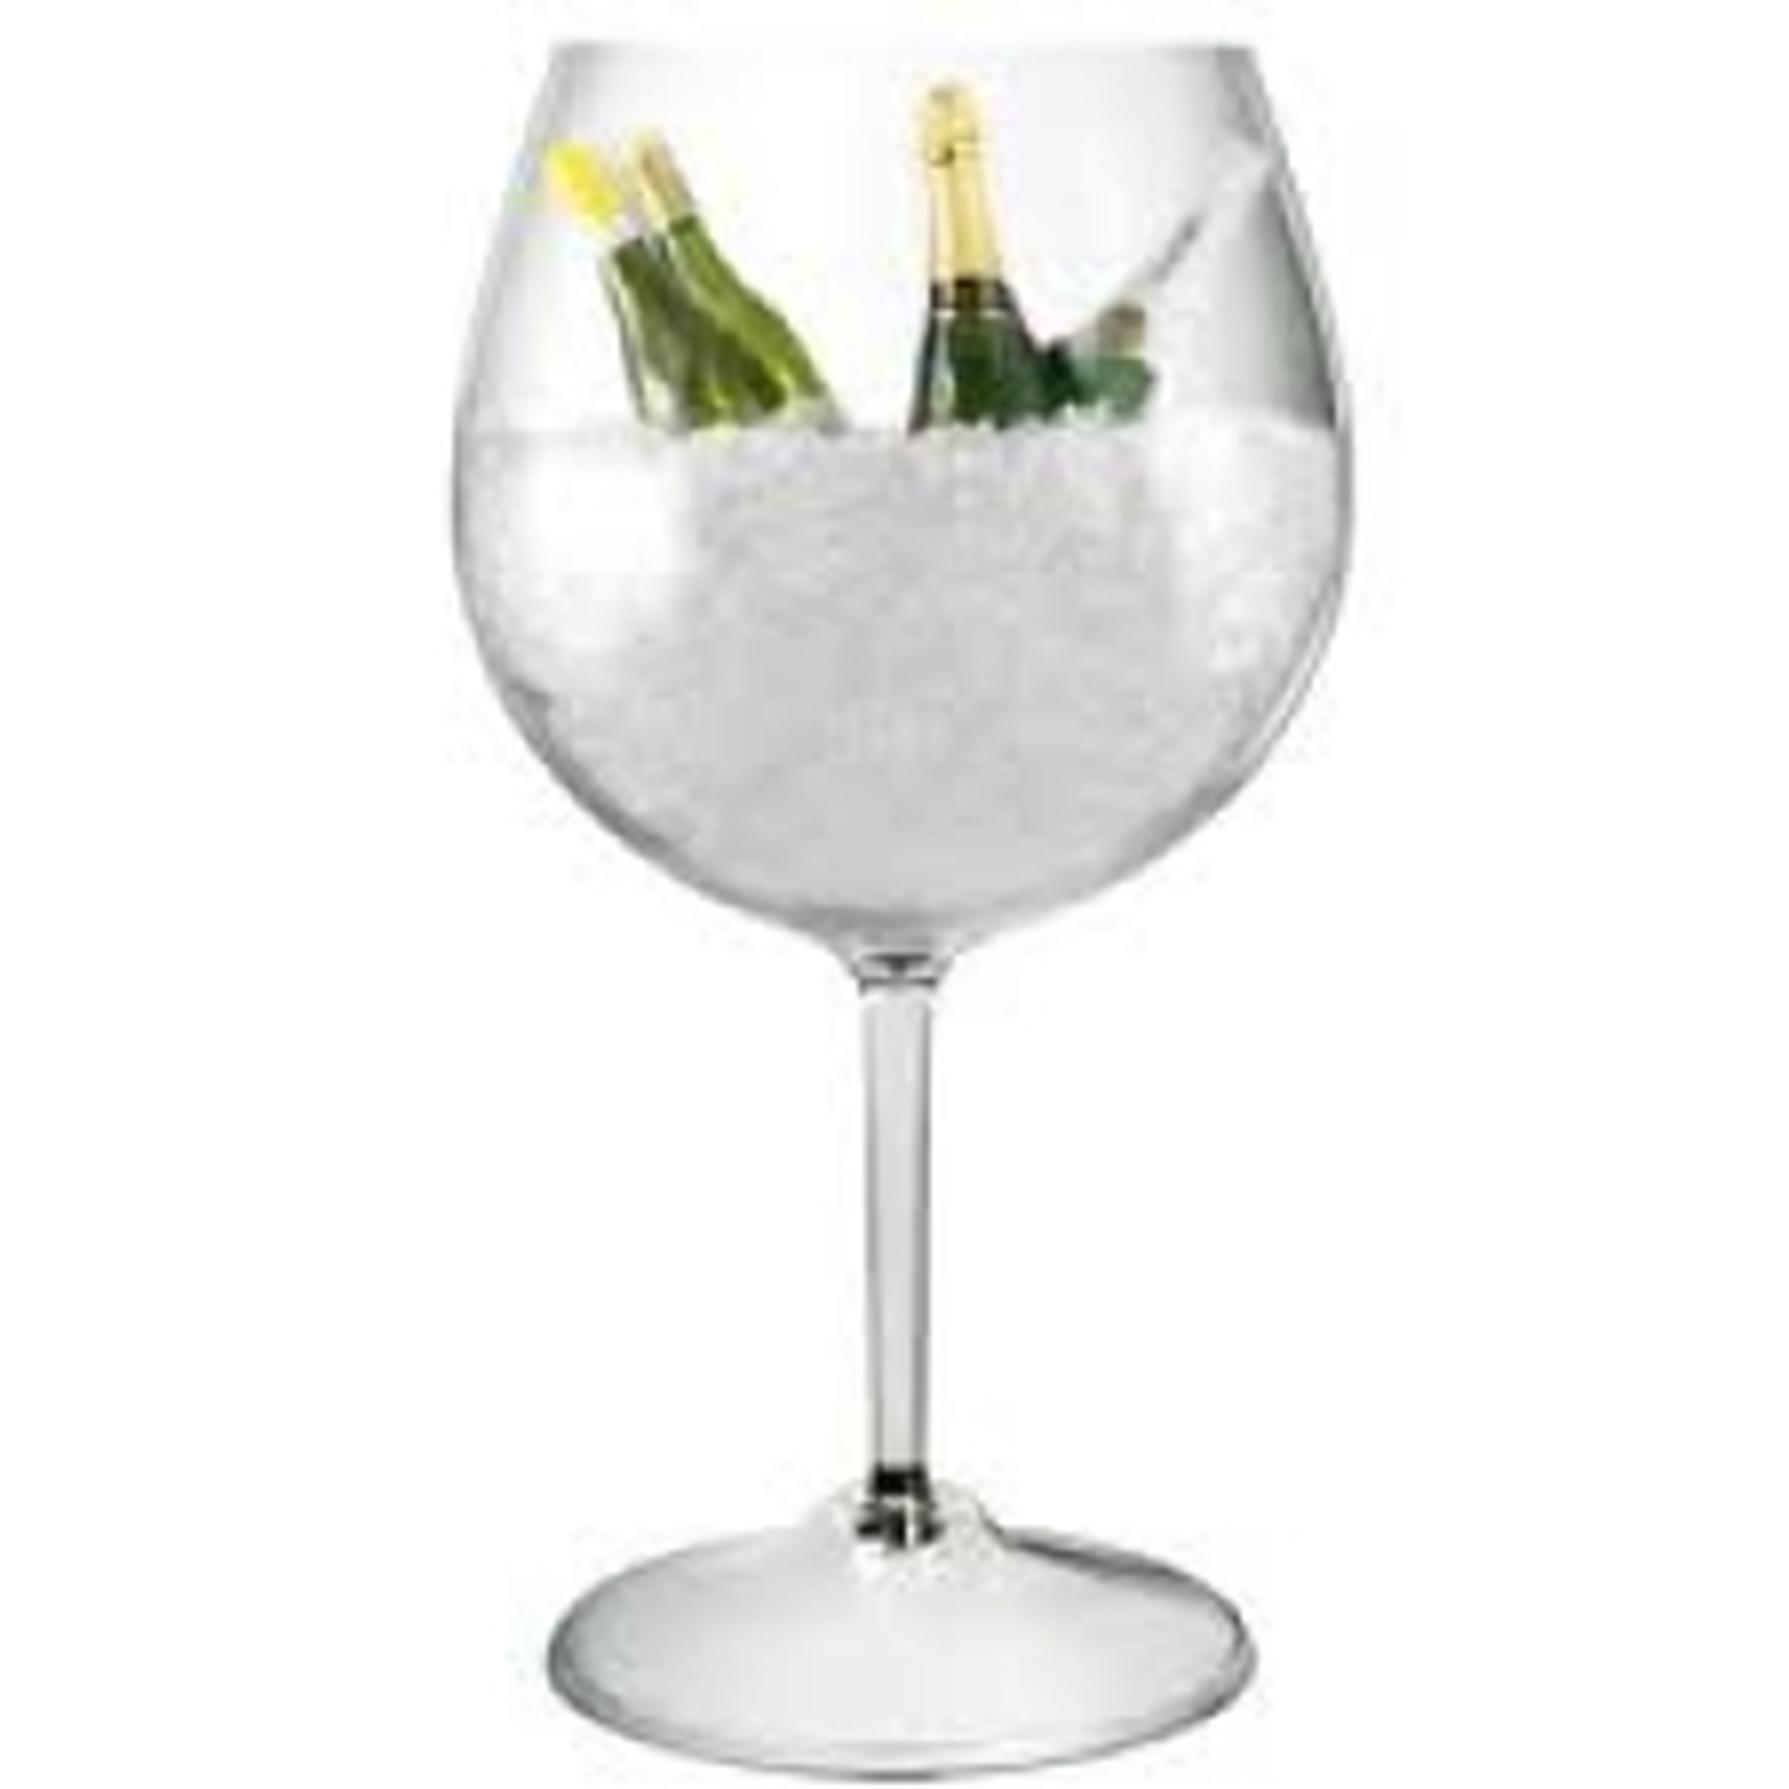 Giant Wine Glass Ice Tub Acrylic